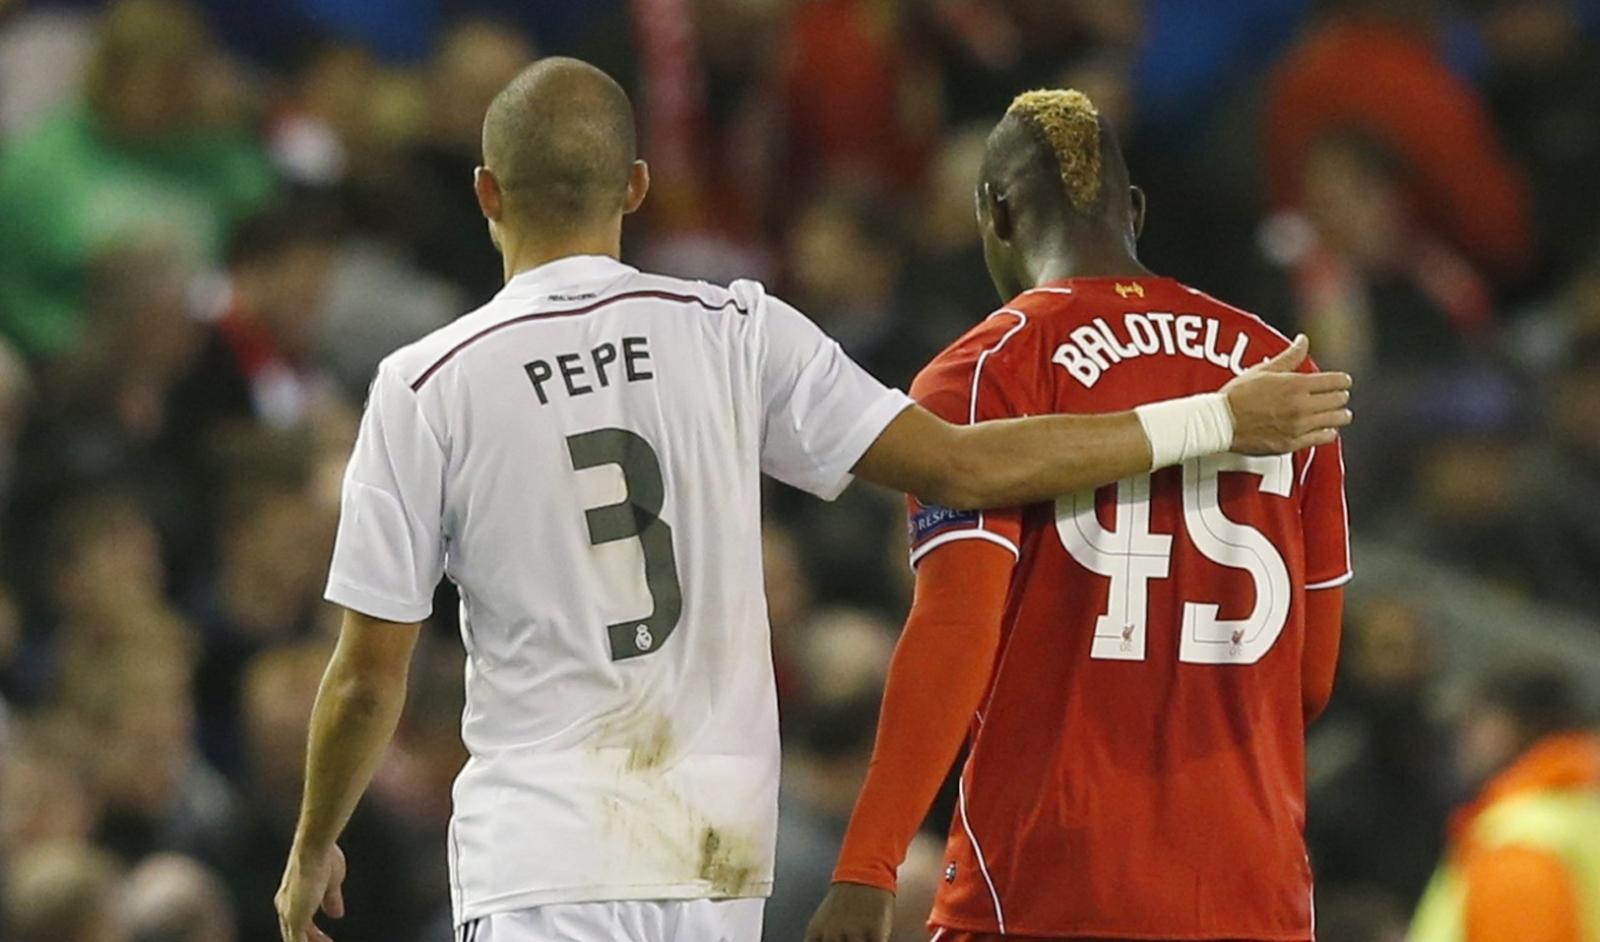 Pepe and Mario Balotelli